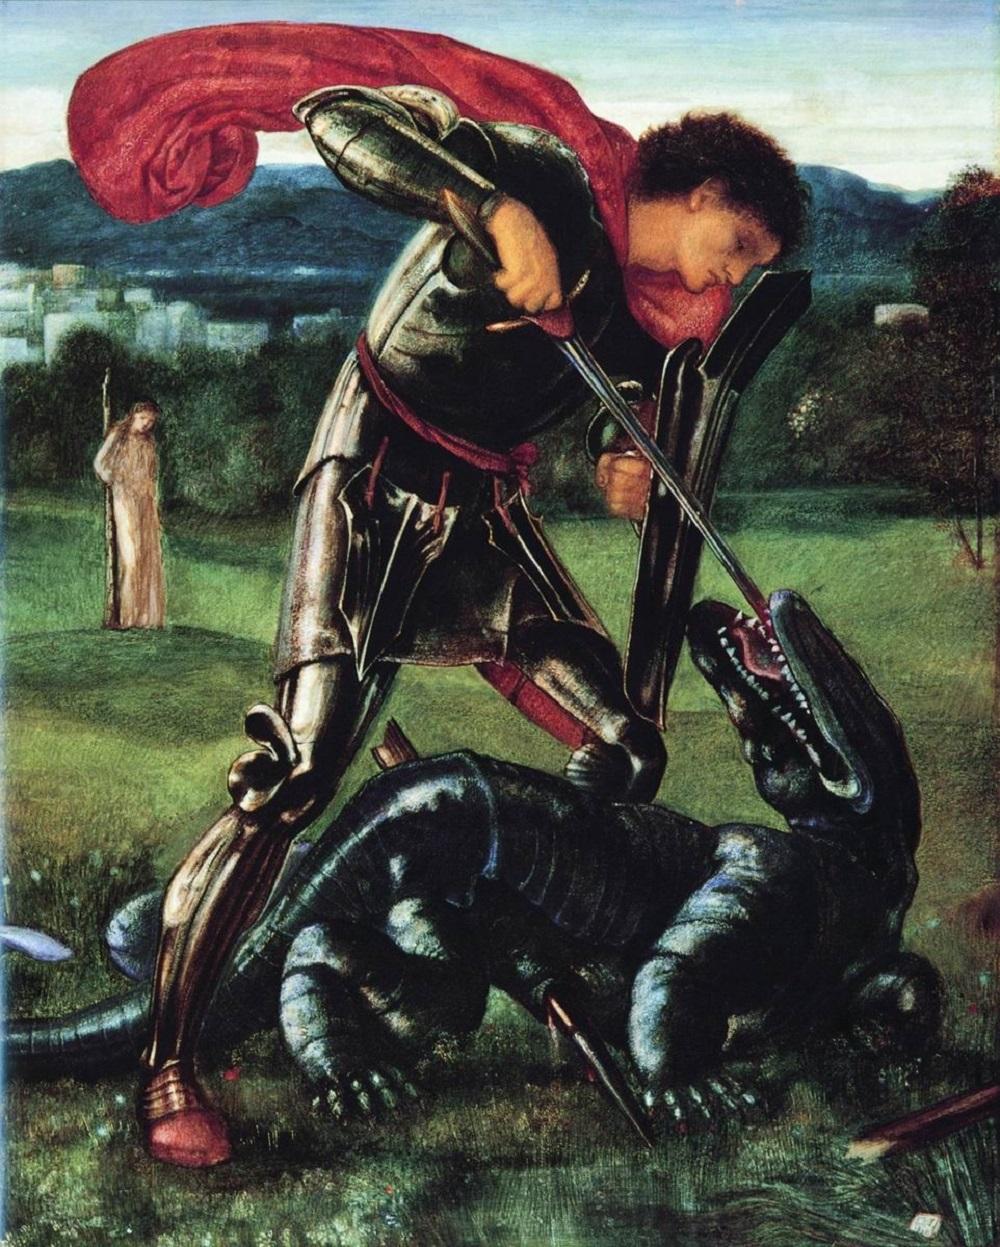 1868 Берн-Джонс, Эдуард Коли Святой Георгий и дракон 1868 холст масло Галерея Уильяма Морриса, Лондон.jpg